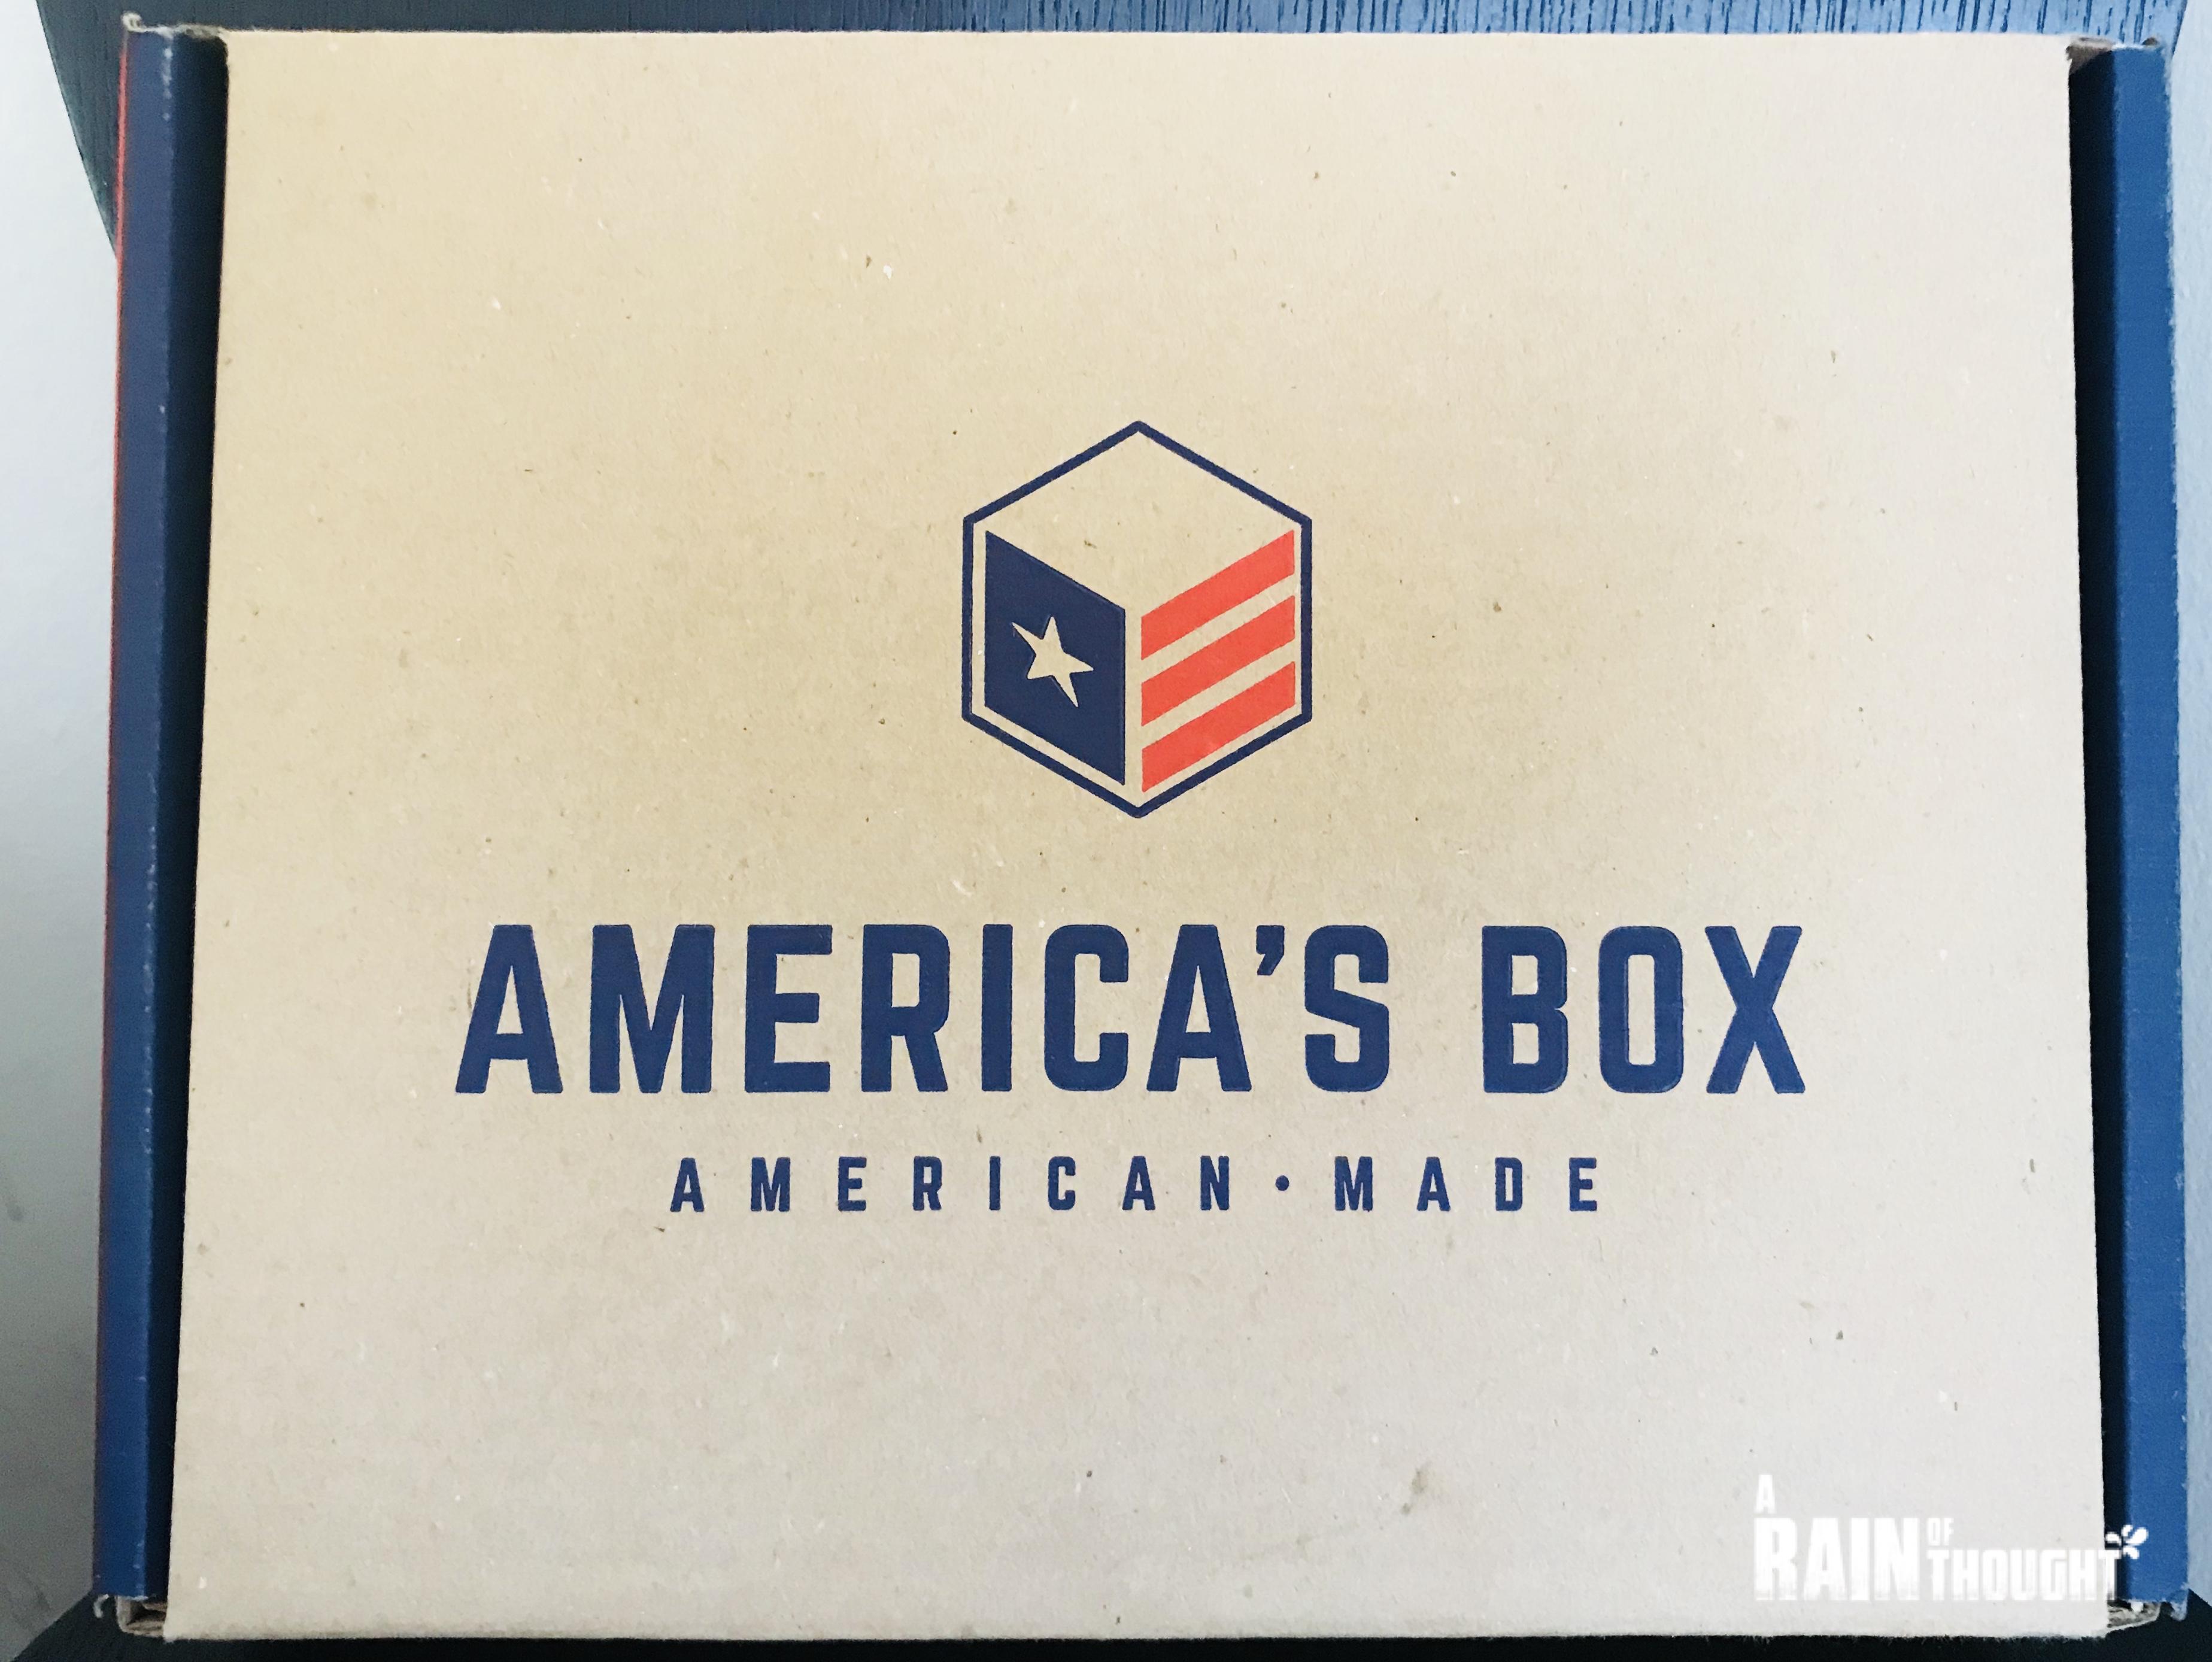 America's Box